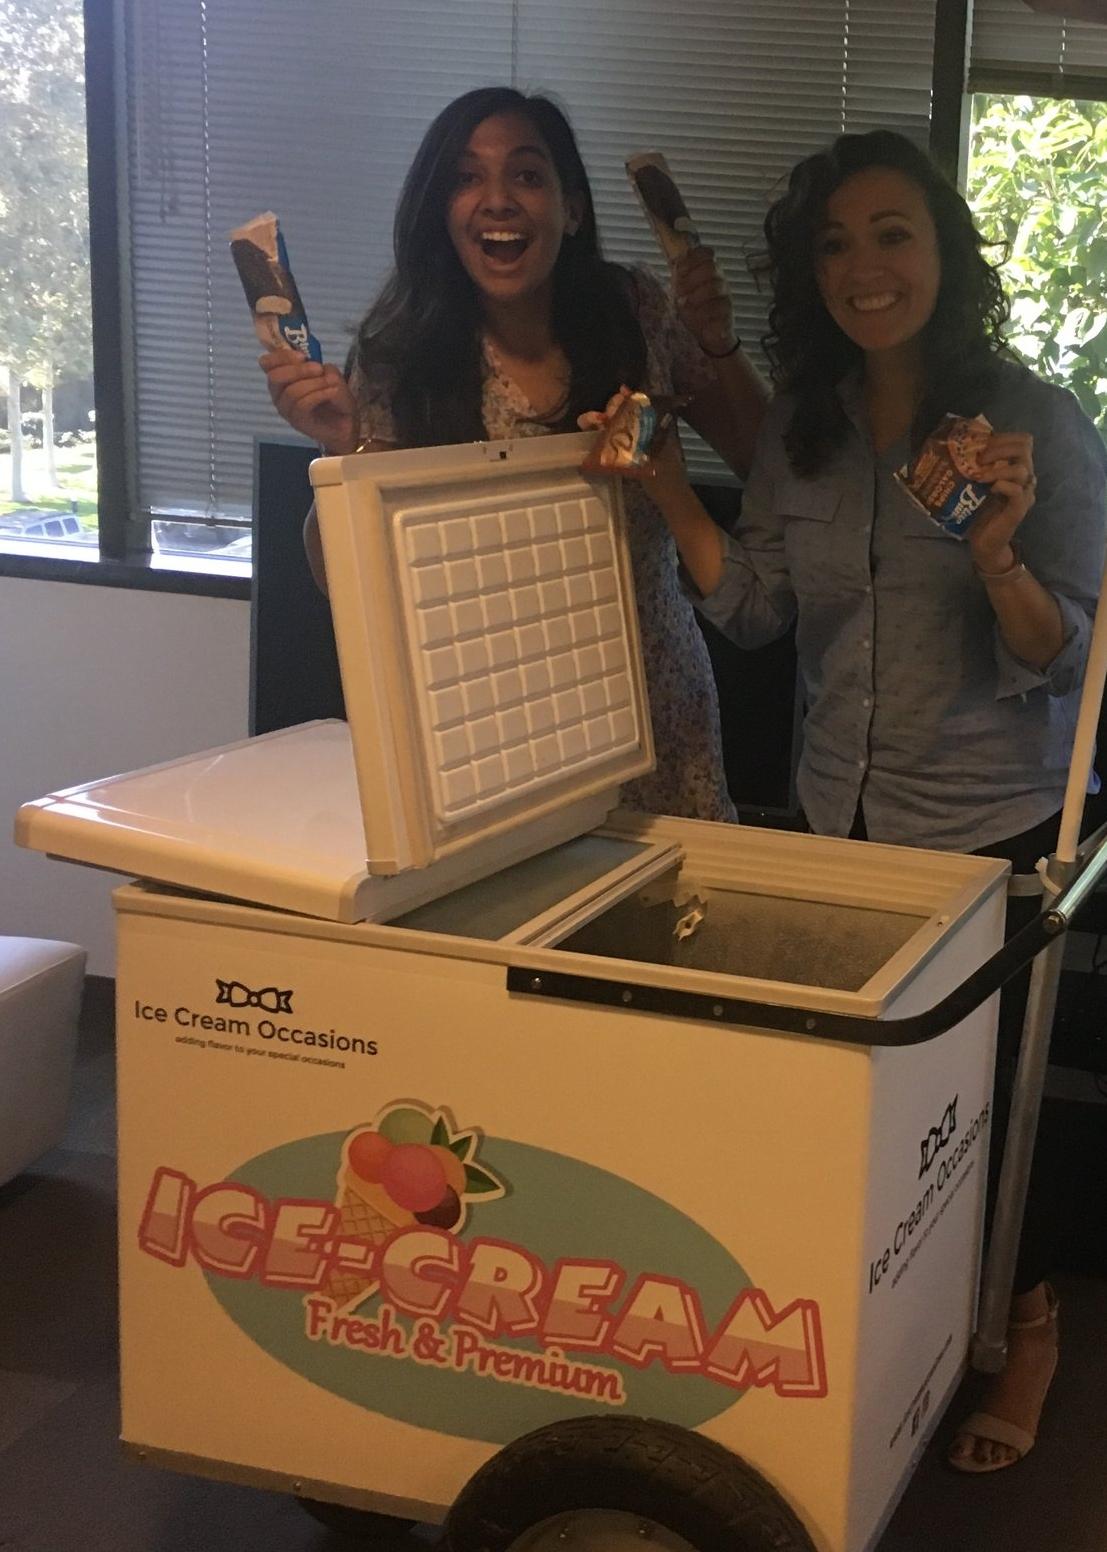 icecreamcart-office-party.JPG